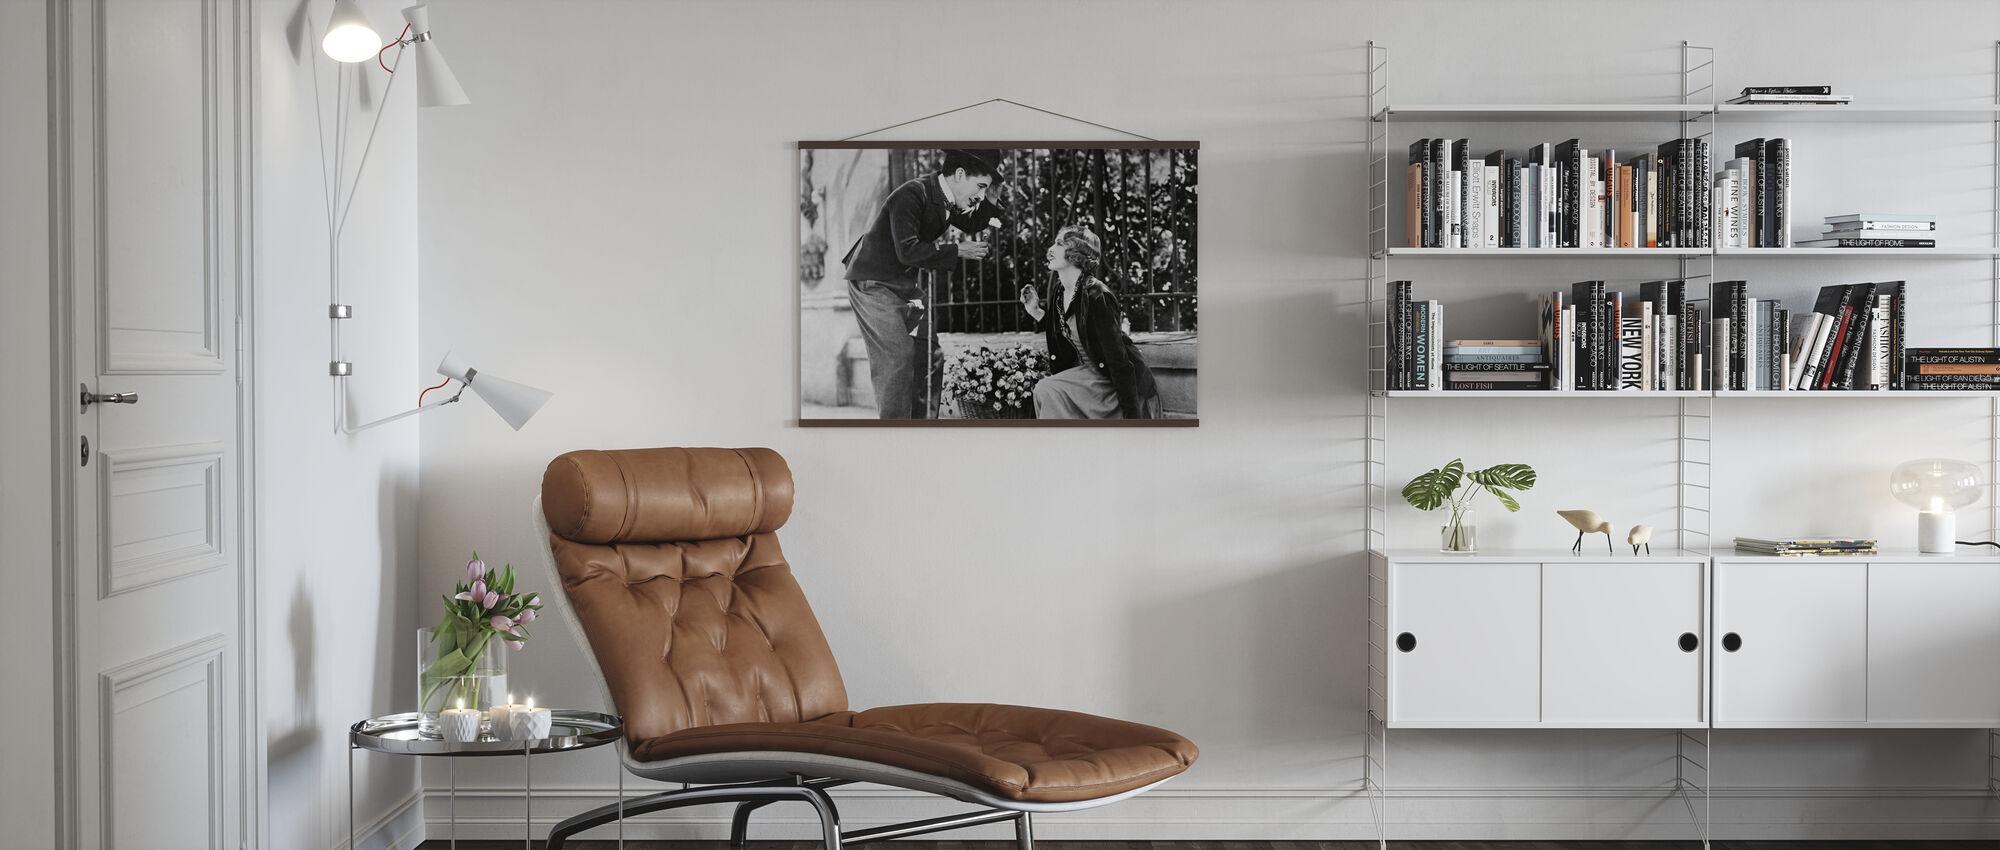 Charlie Chaplin and Virginia Cherrill in City Lights - Poster - Living Room